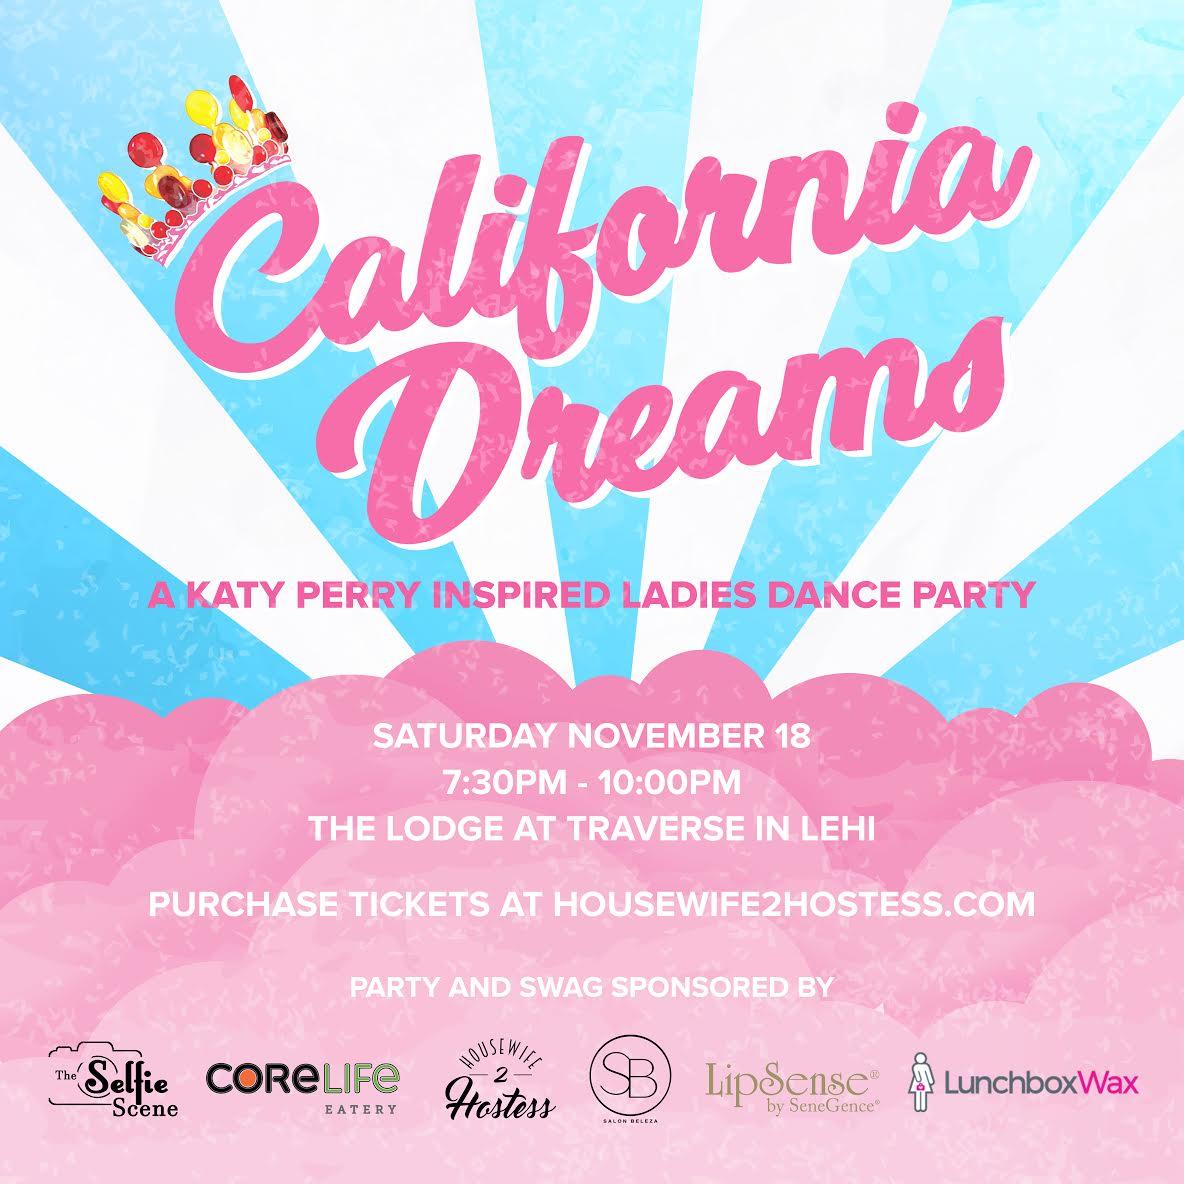 California Dreams Dance Party